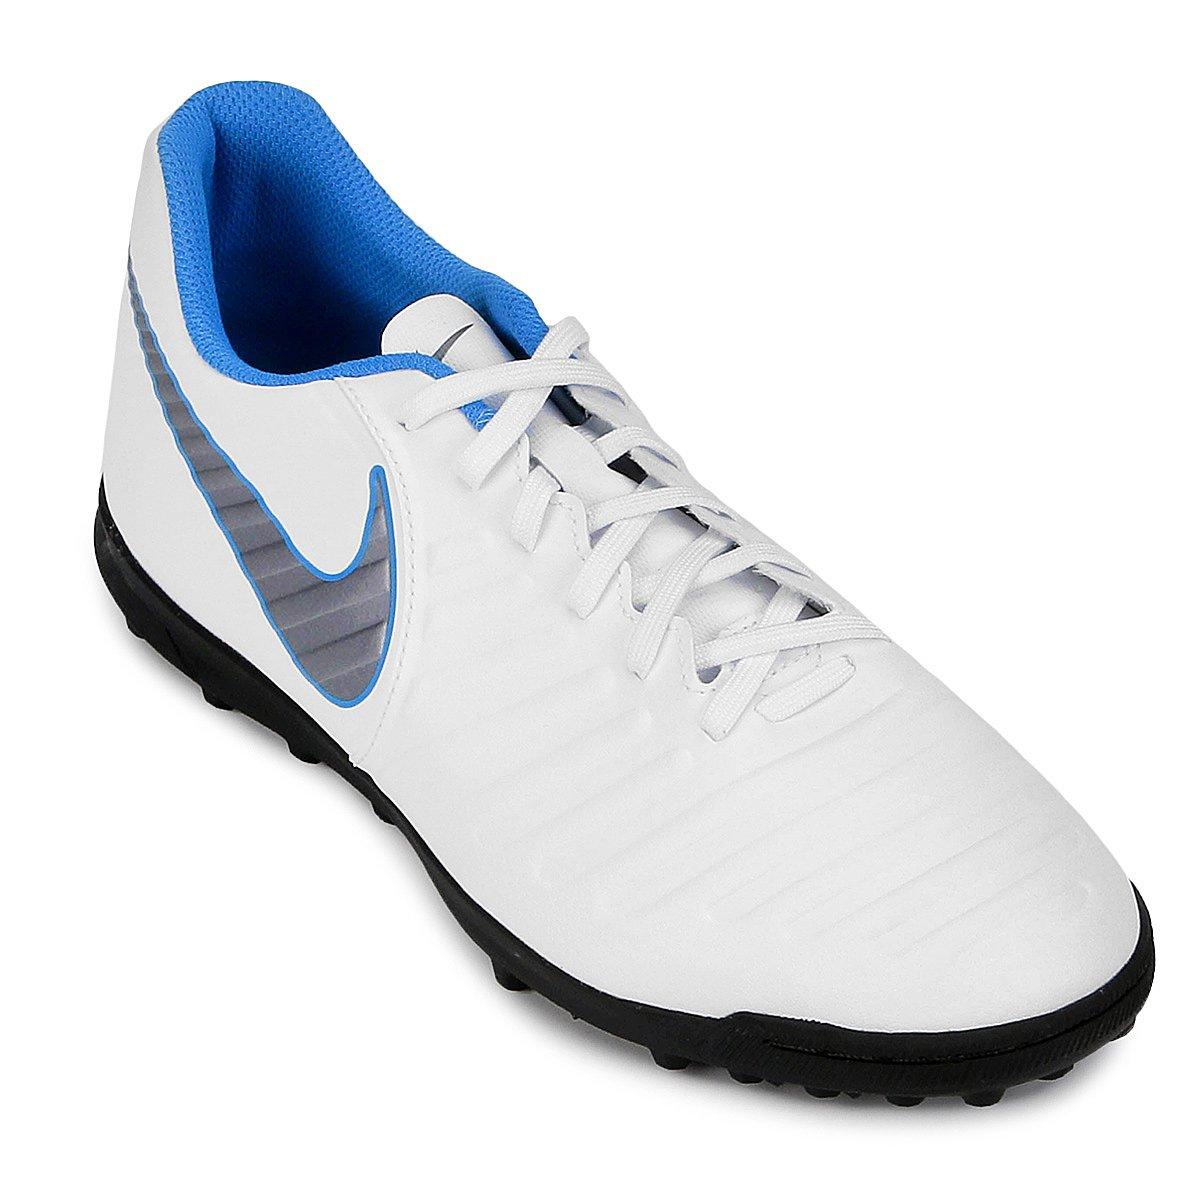 71125a9ef1dfd Chuteira Society Nike Tiempo Legend 7 Club TF - Branco e Cinza - Compre  Agora